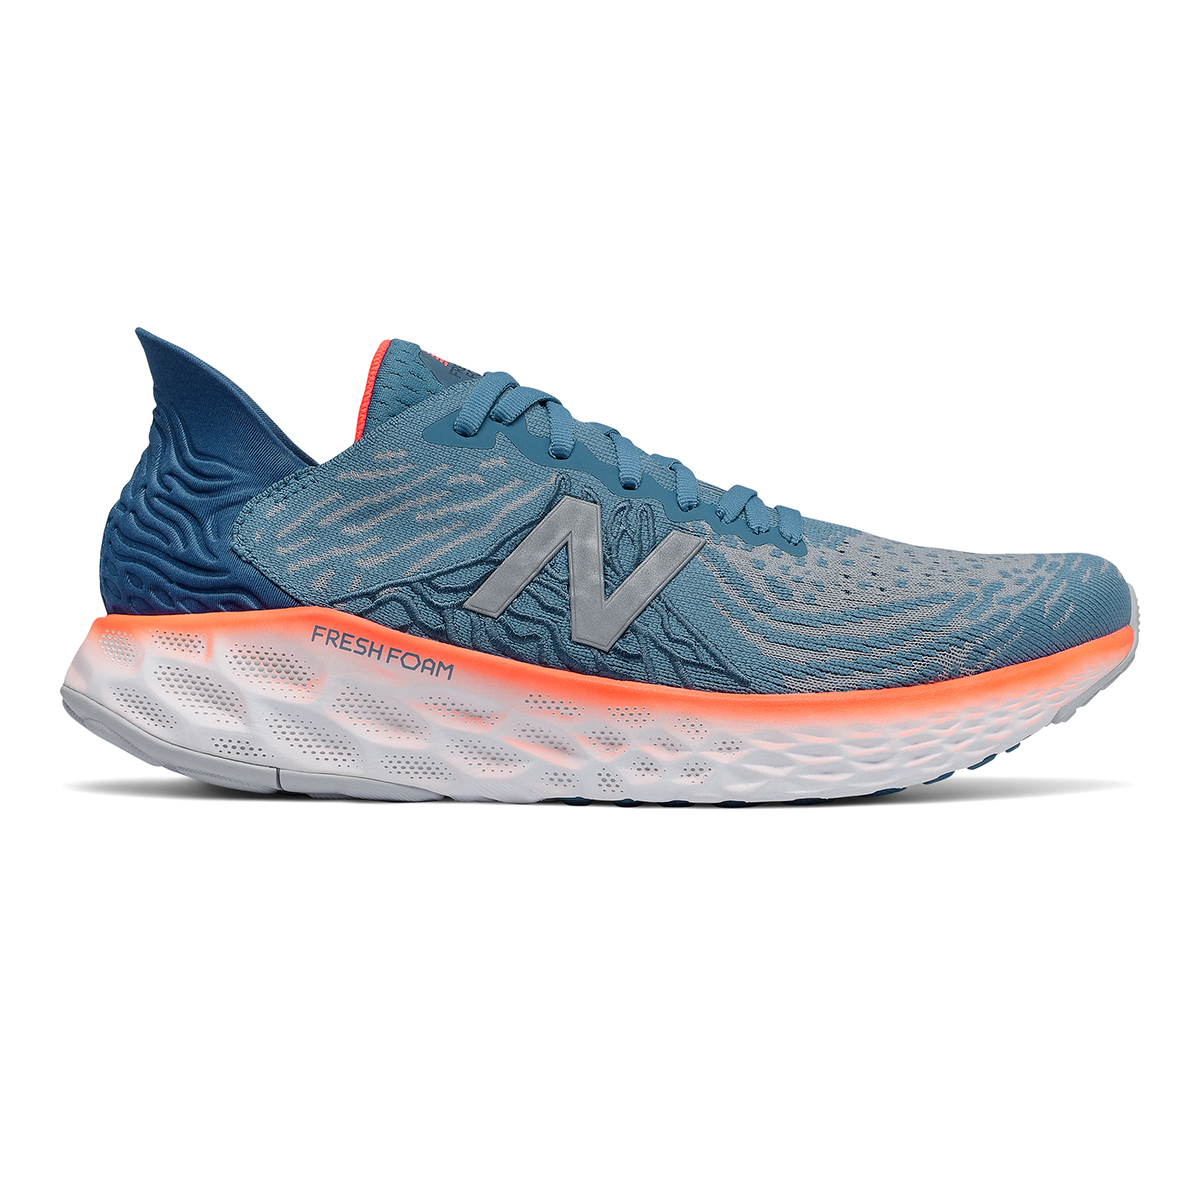 Men's New Balance Fresh Foam 1080v10 Running Shoe - Color: Light Blue - Size: 7 - Width: Regular, Light Blue, large, image 1